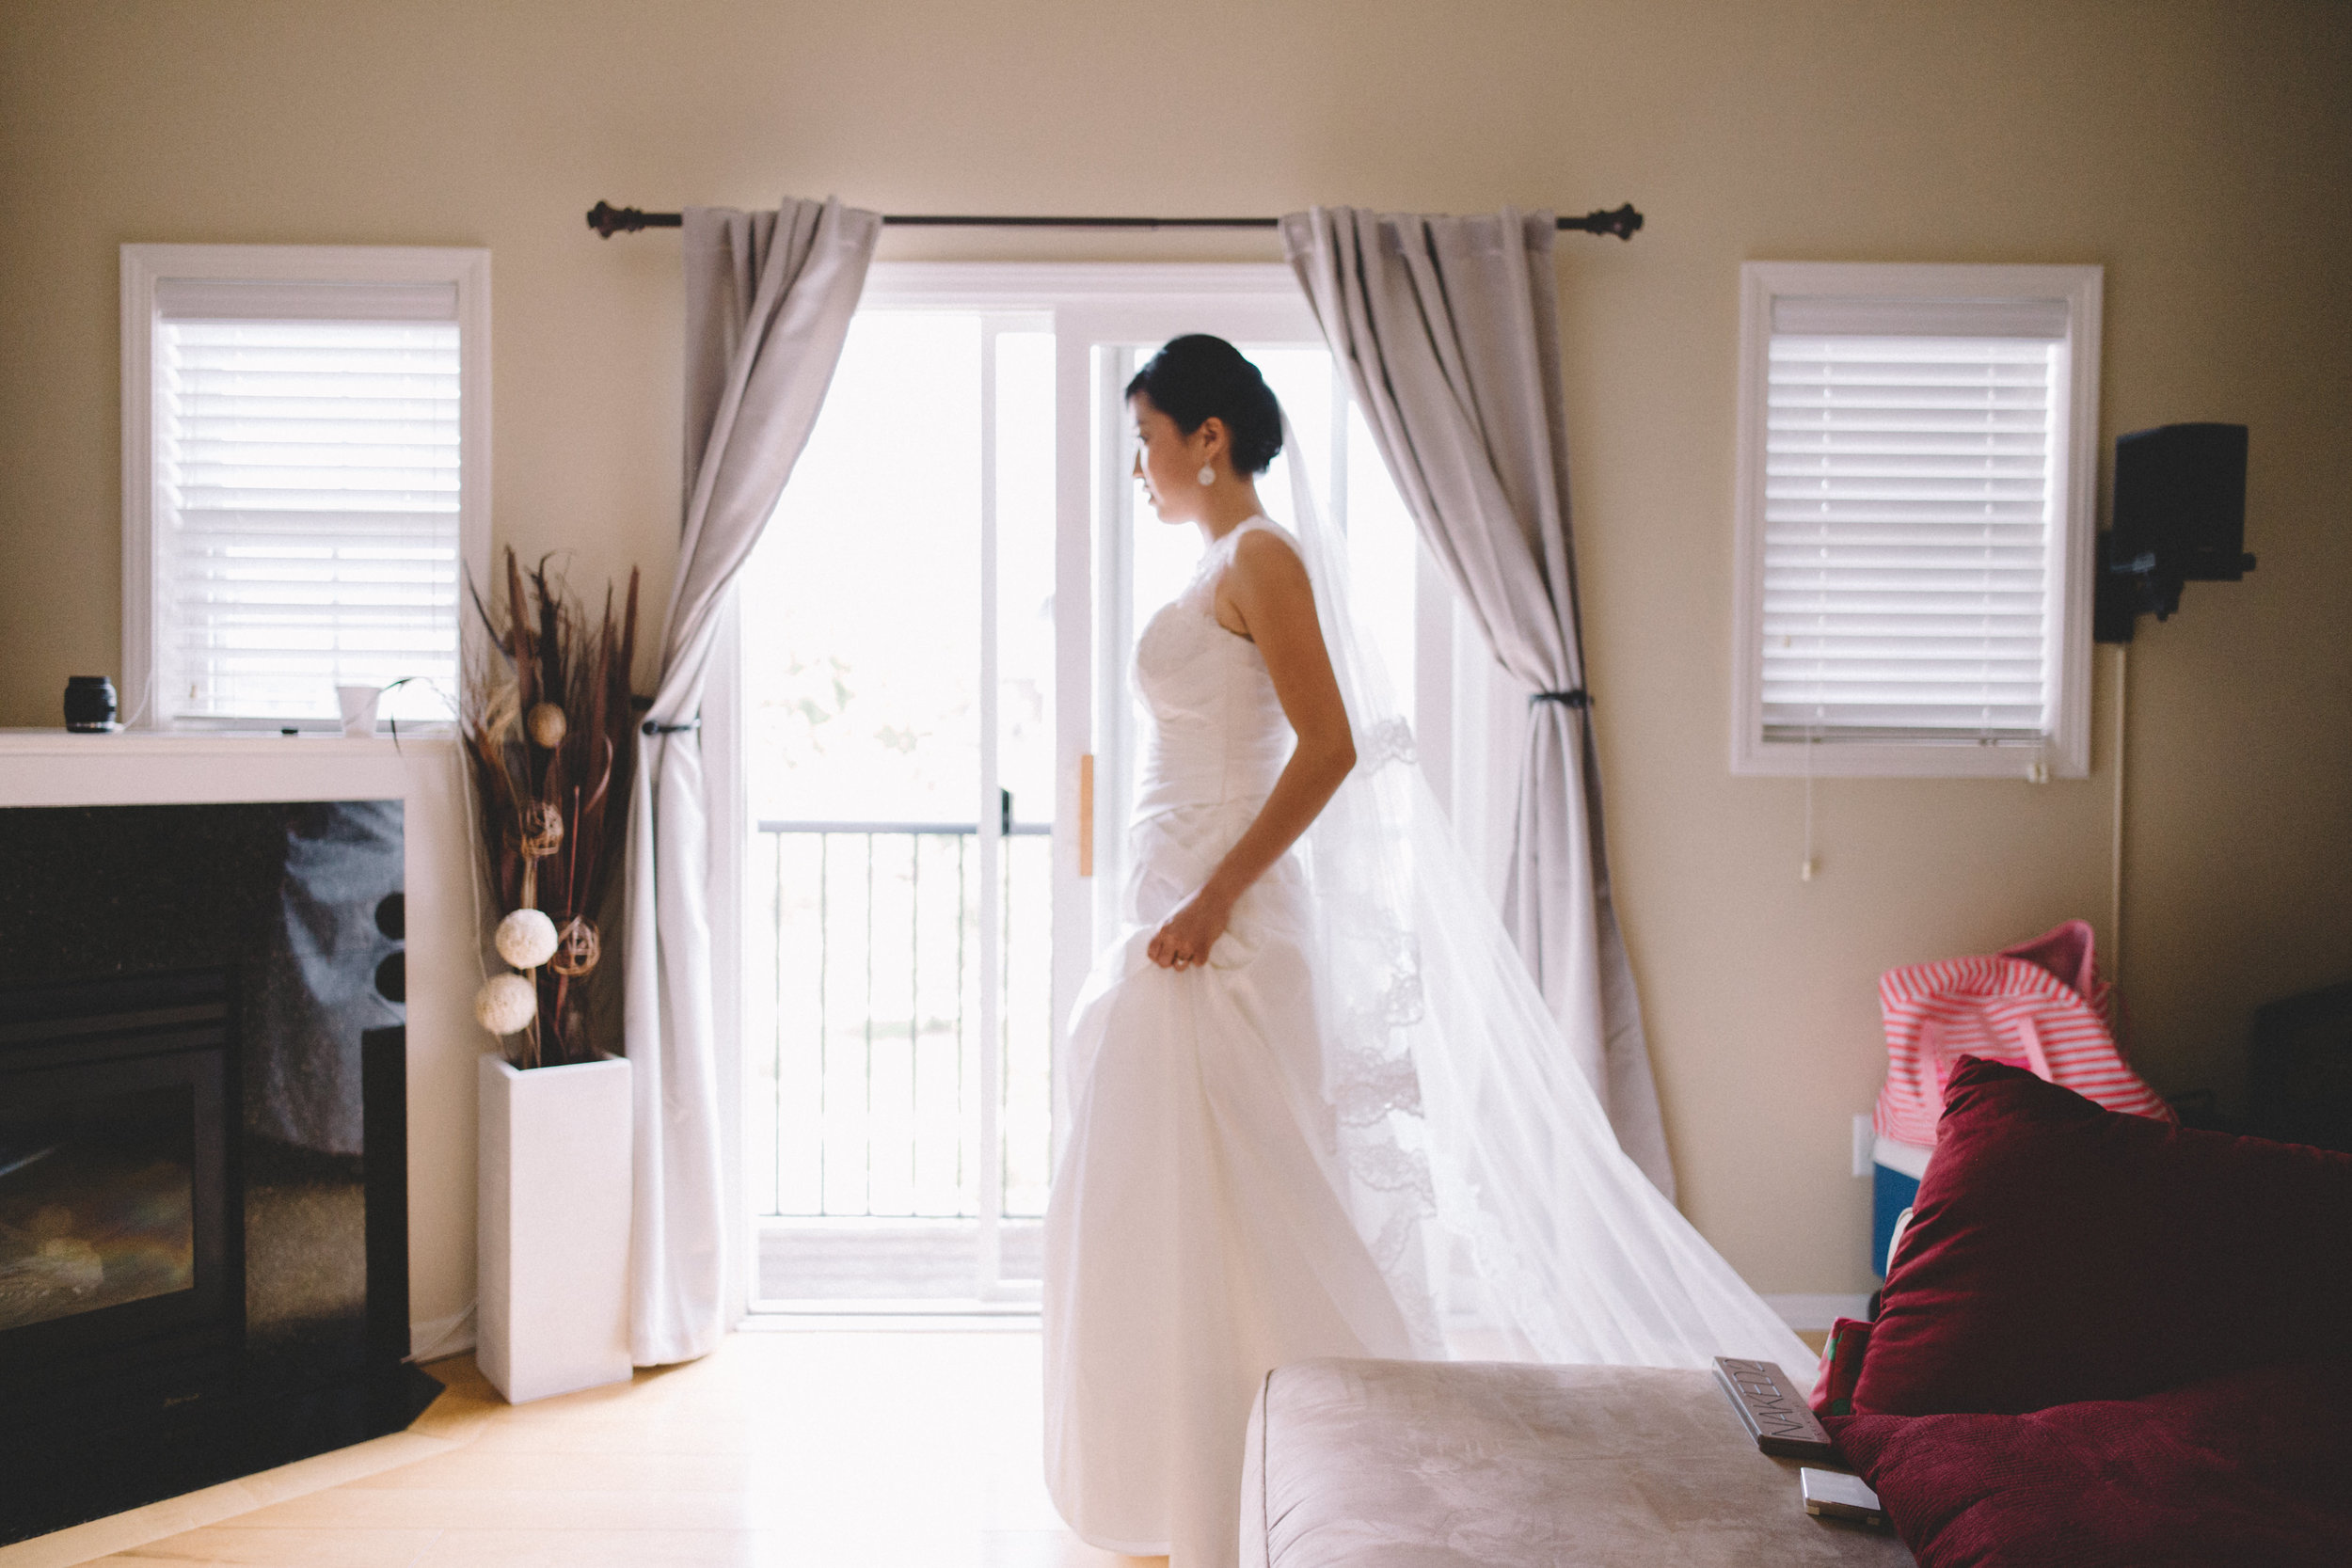 Wedding Dan Chern Photography DC Photography Wedding Photography California Bay Area Wedding Photography David and Julie Wedding Dress Bride